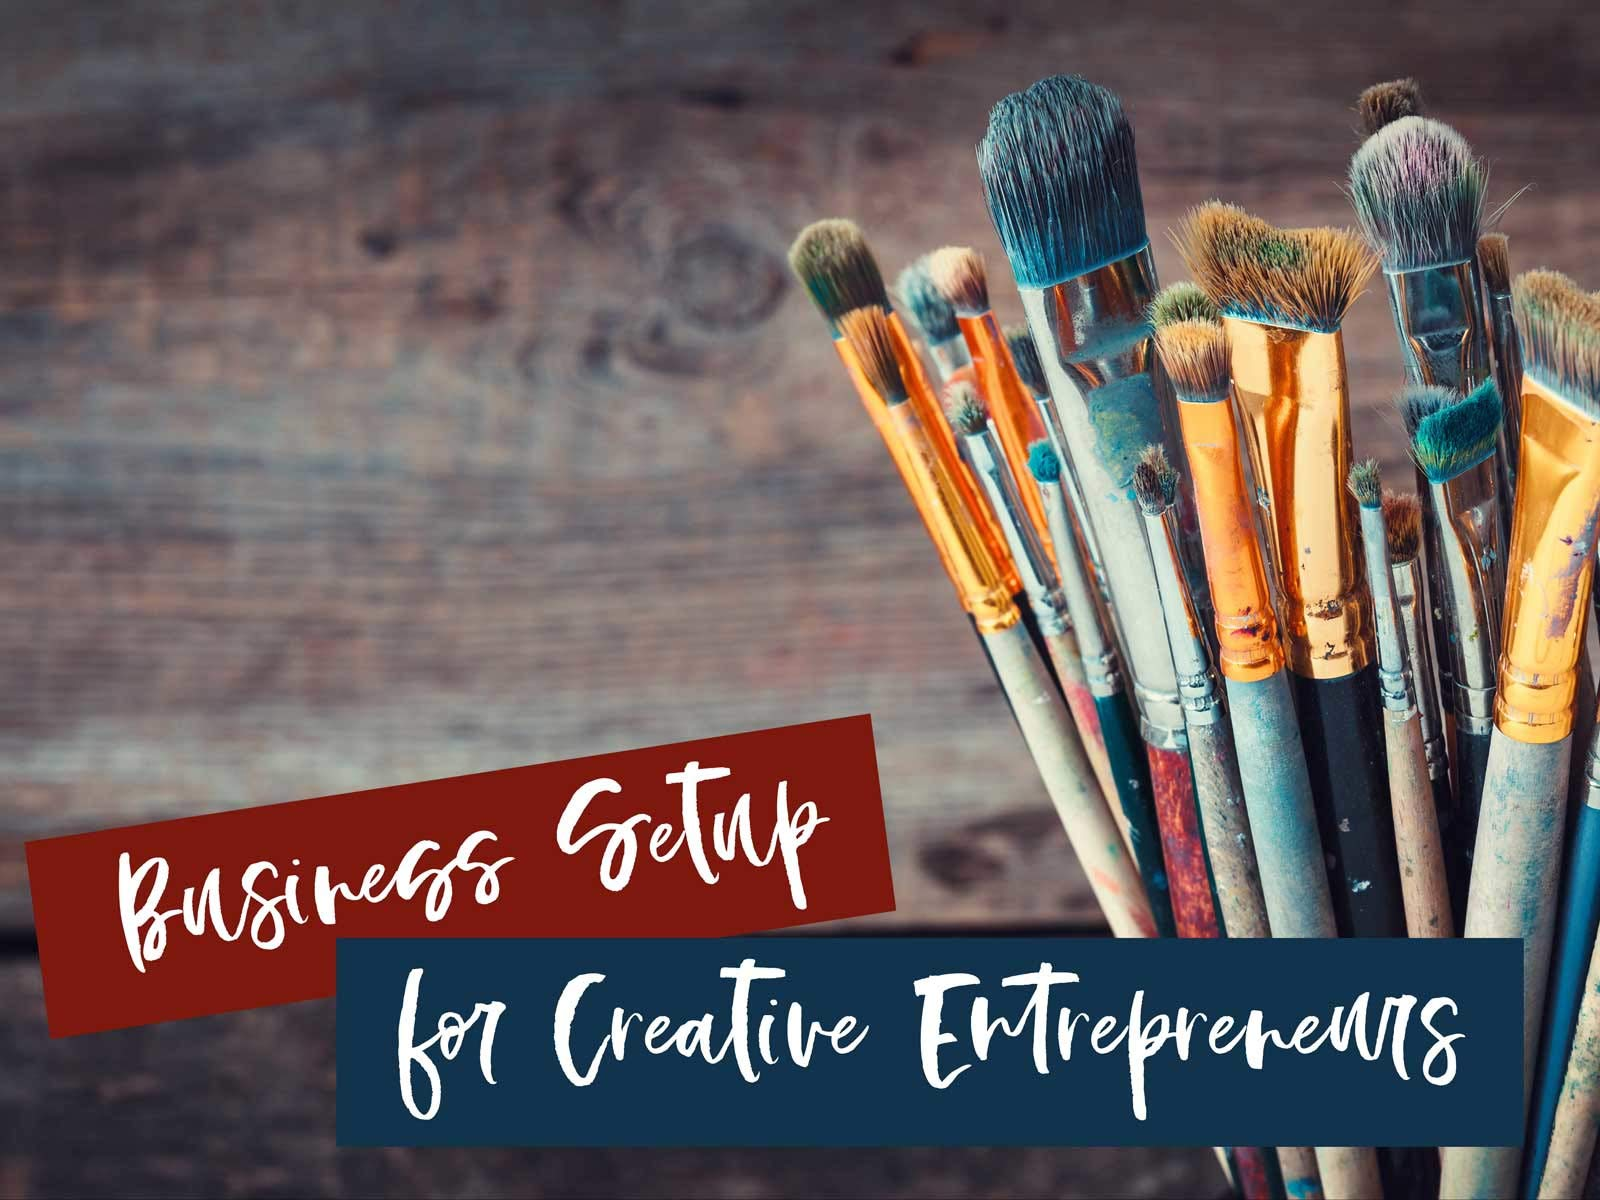 Business Setup for Creative Entrepreneurs on Amazon Prime Instant Video UK